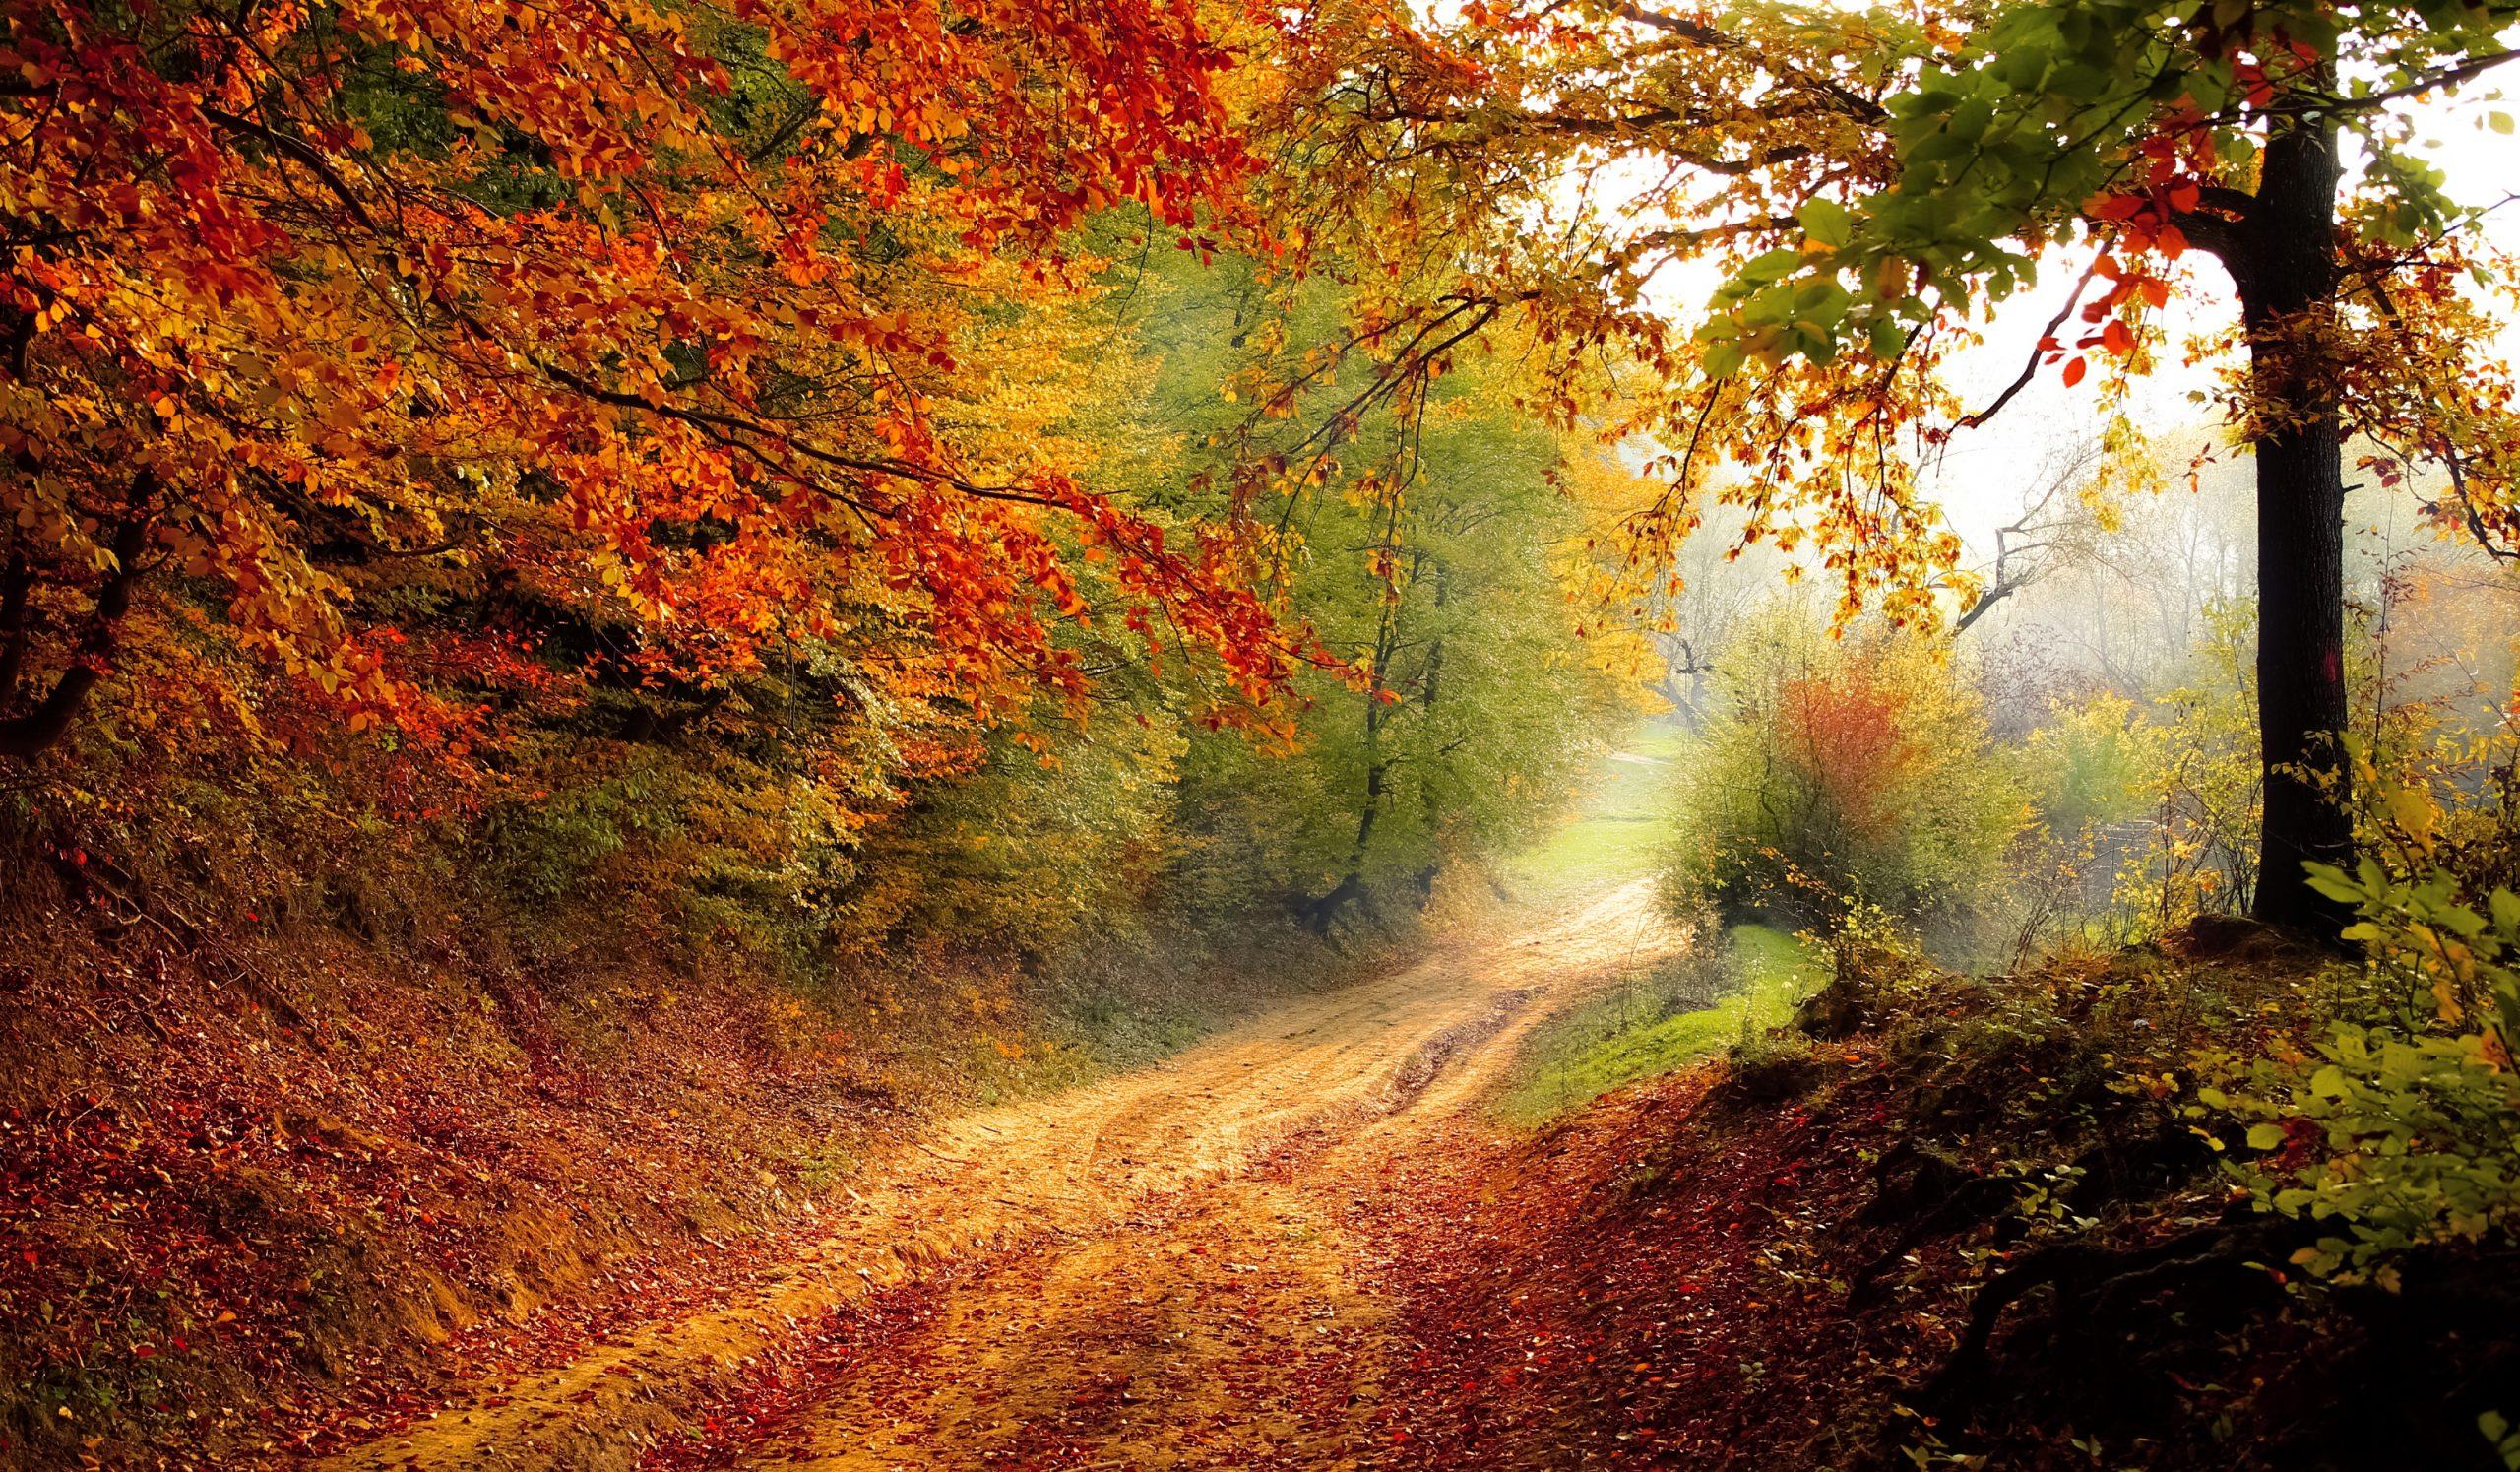 Herbst Blätter Laub